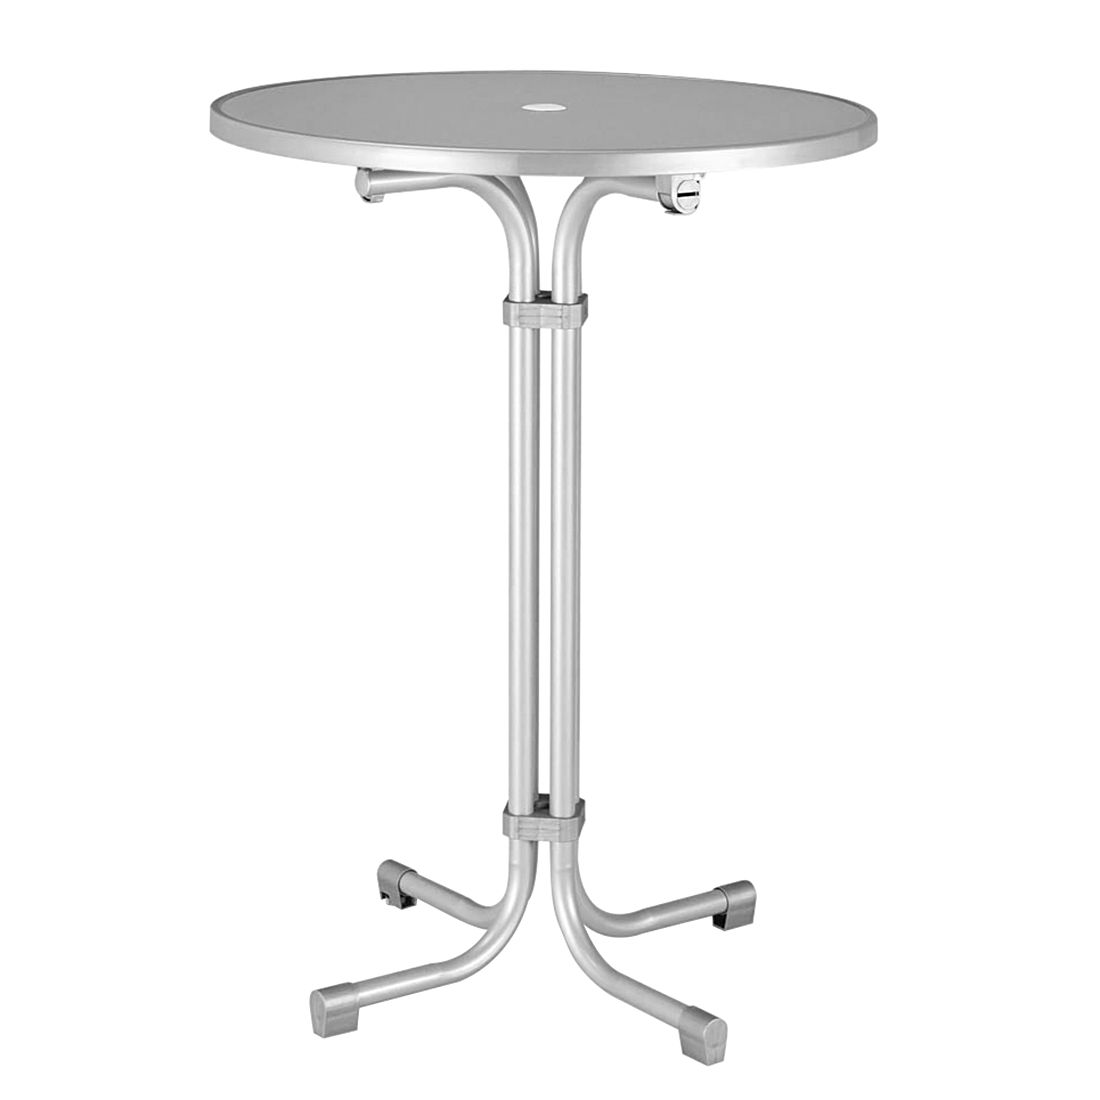 tavolino da bar Mulitflex - Tubo di acciaio color argento, Best Freizeitmöbel